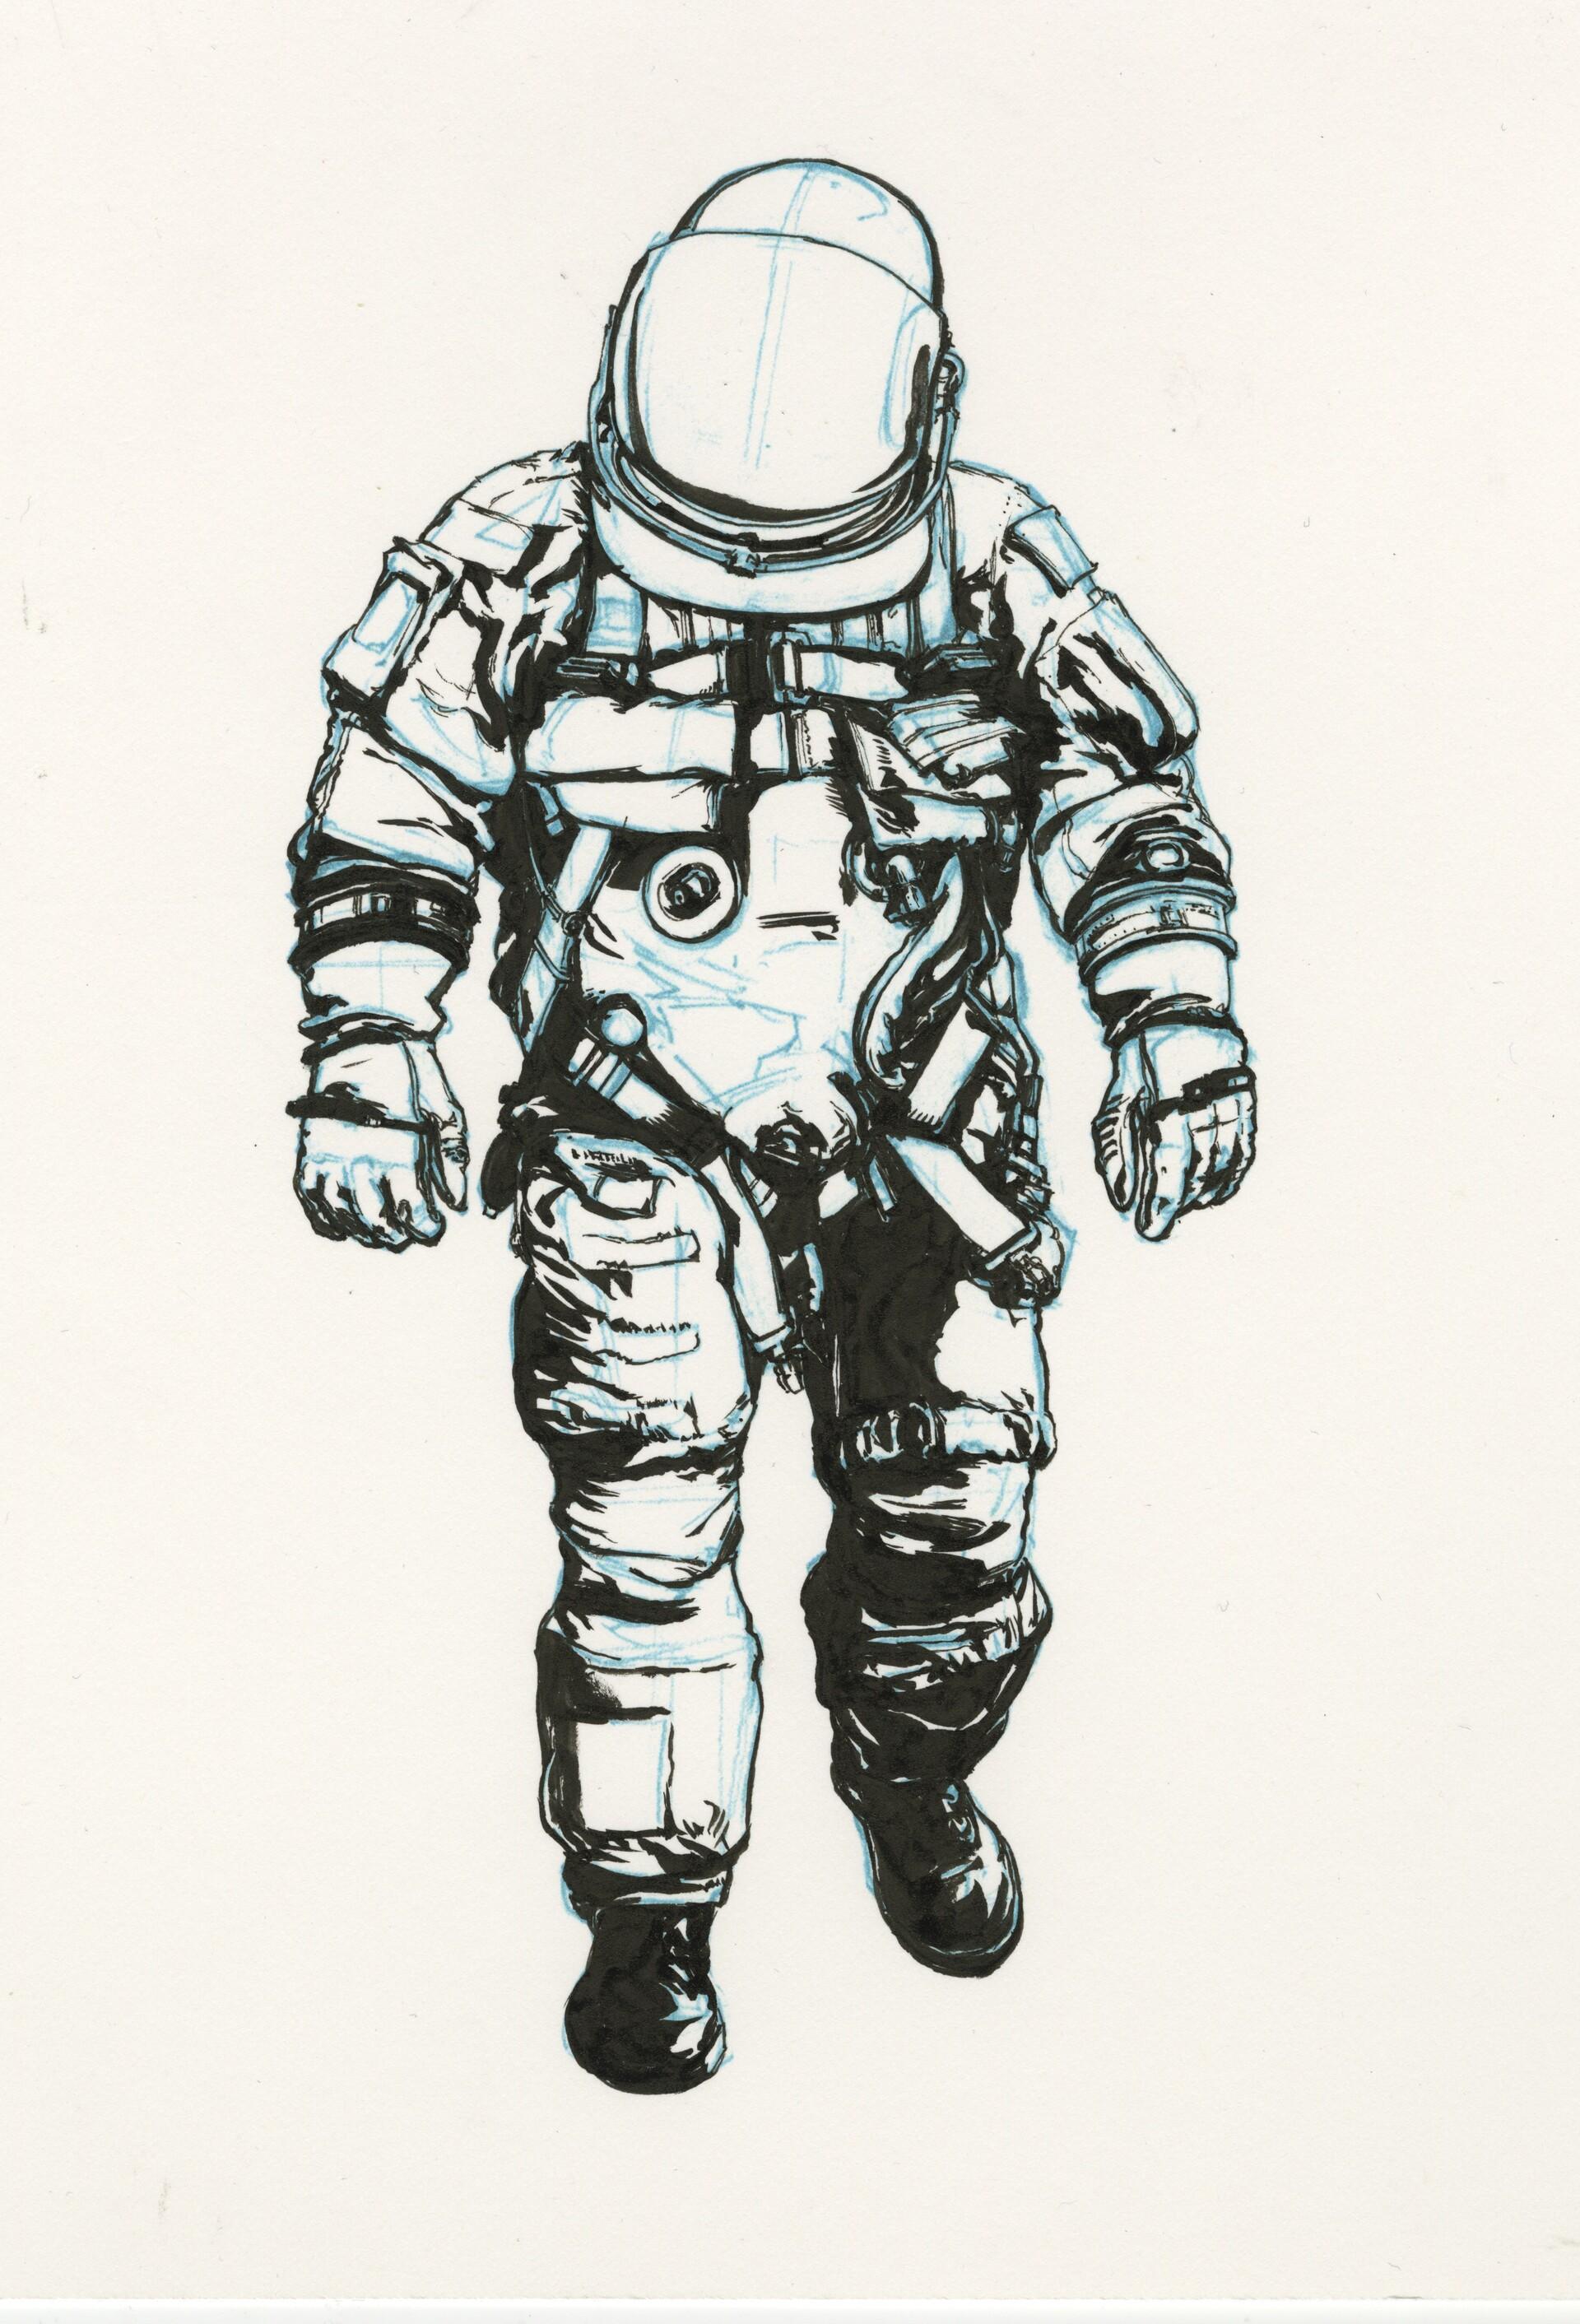 Moon to Mars: Astronaut Ink